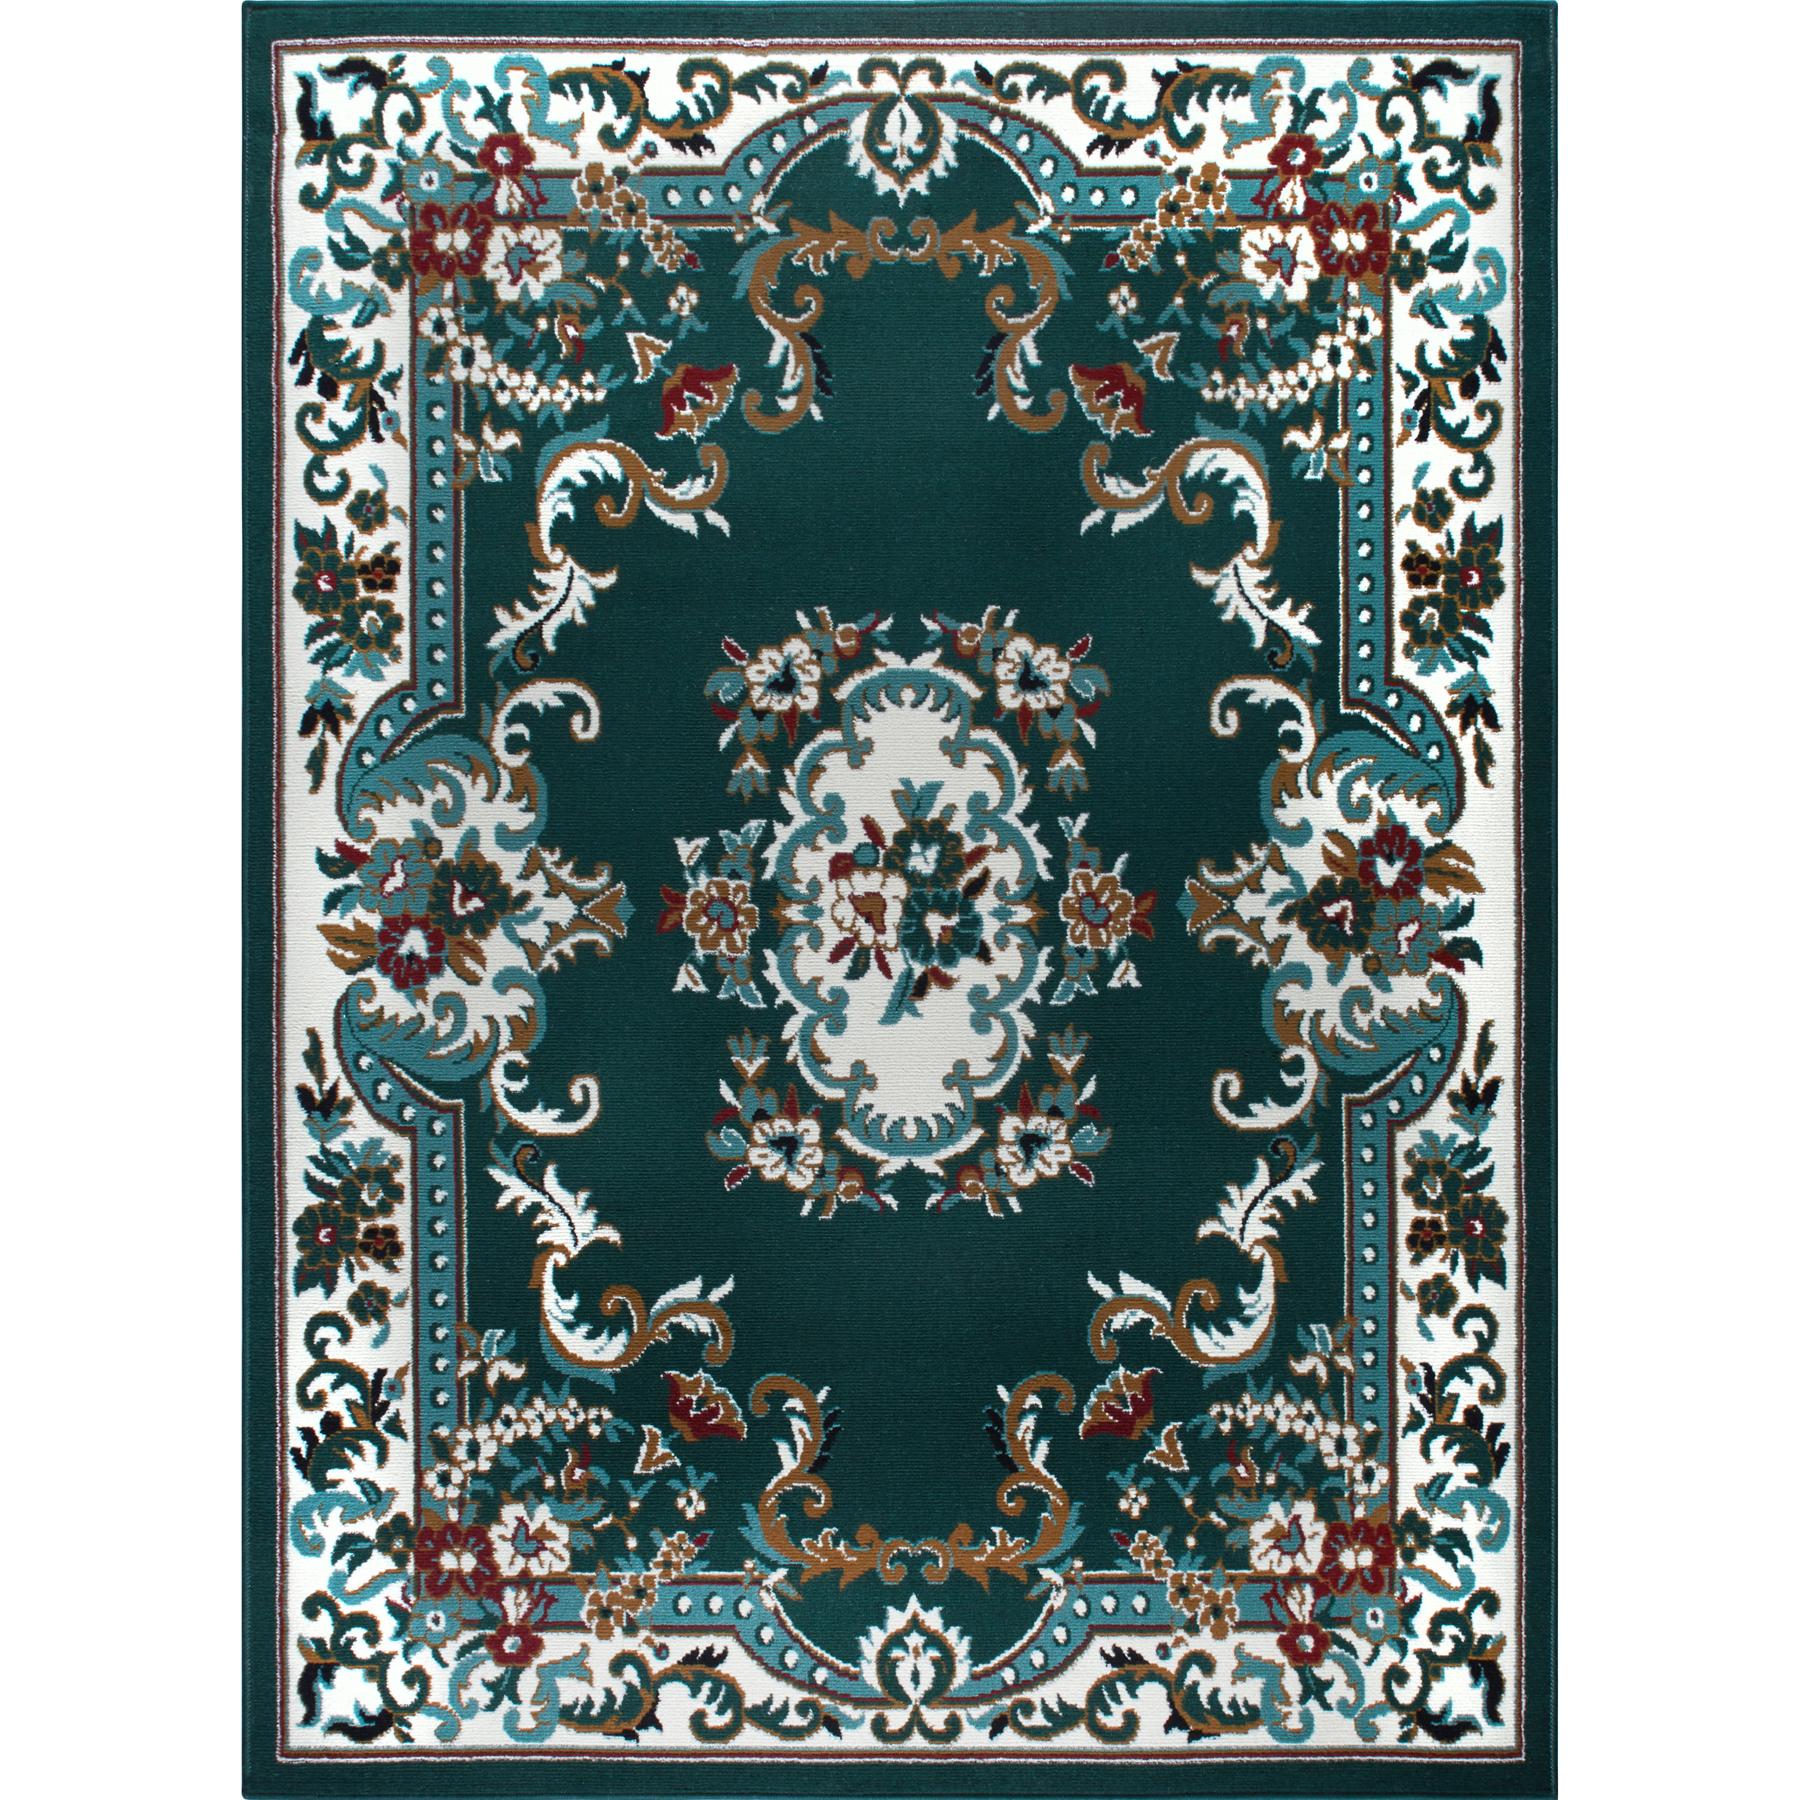 Oriental-Floral-Border-Medallion-Area-Rug-Scrolls-Traditional-Persien-Carpet thumbnail 5